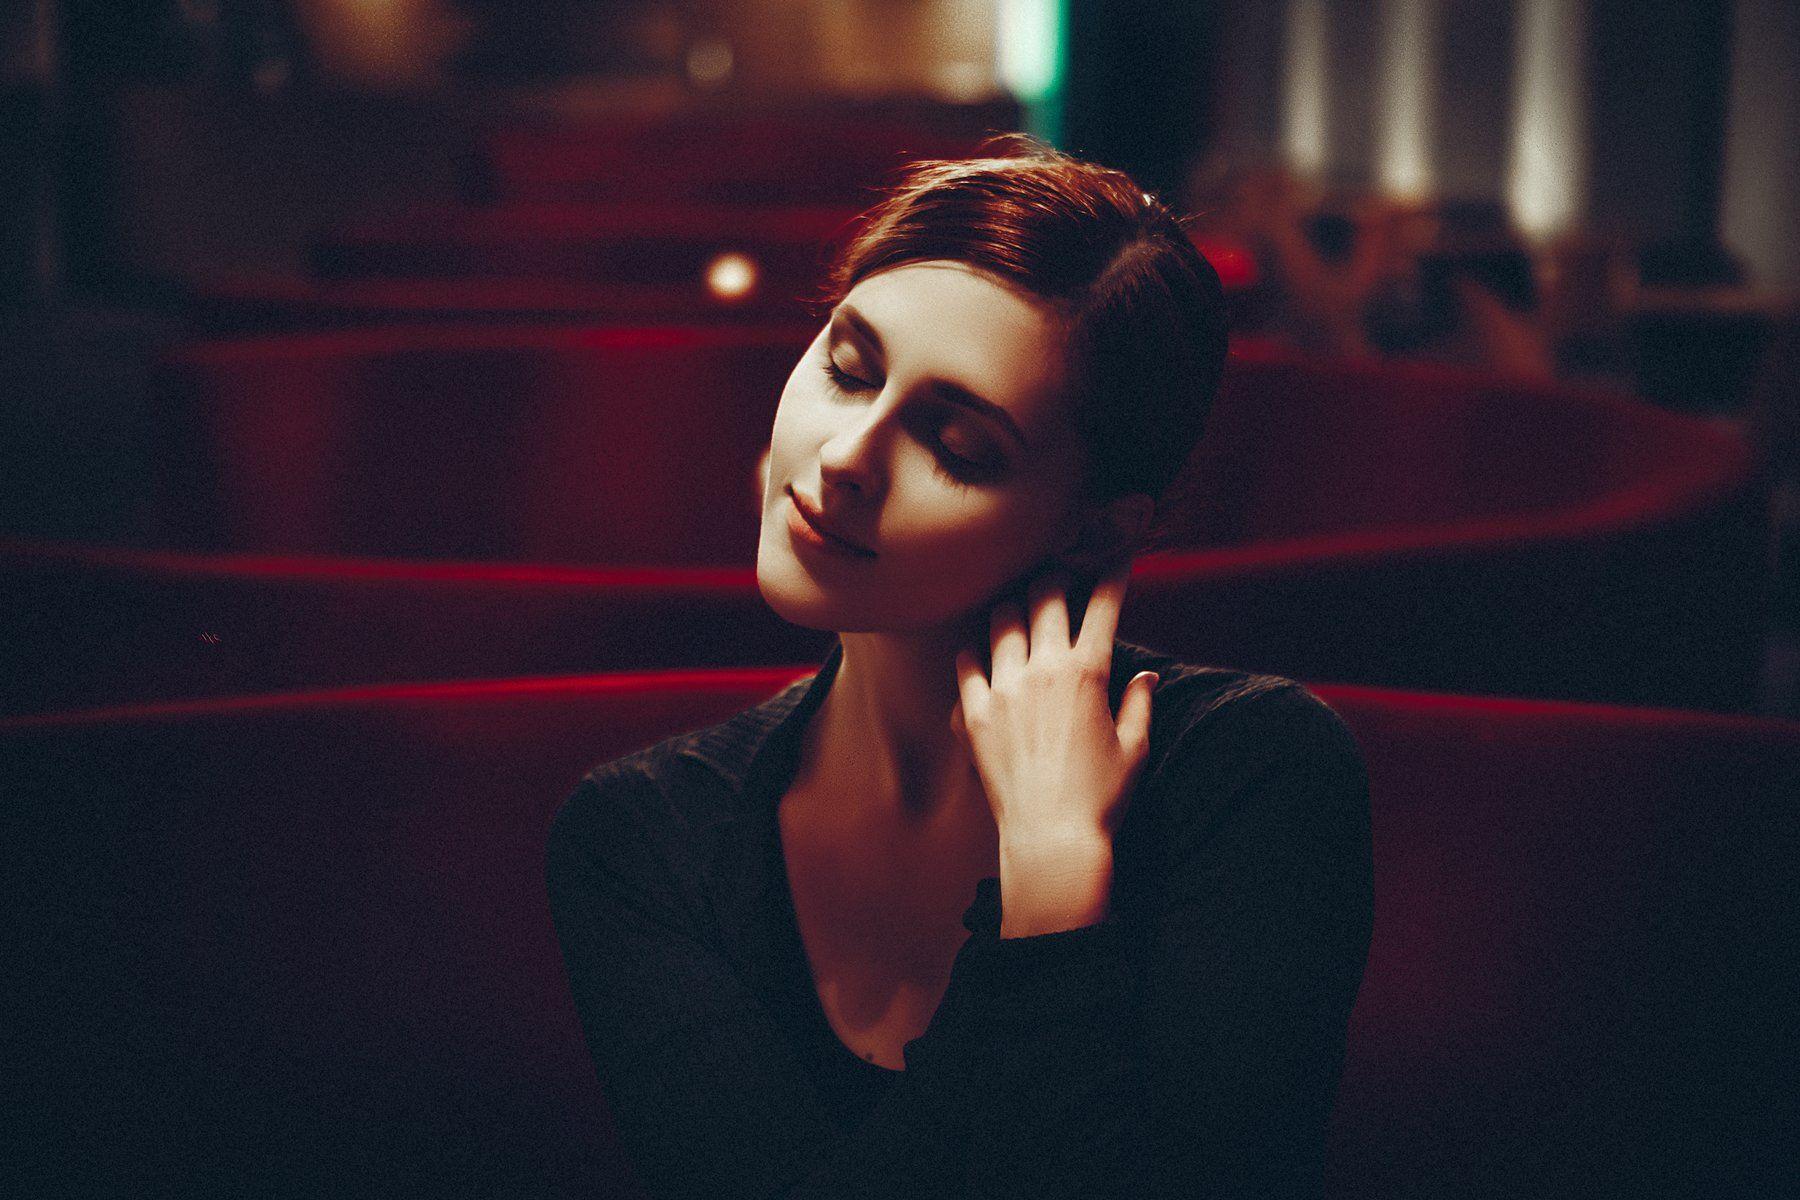 woman, portrait, mood, Руслан Болгов (Axe)